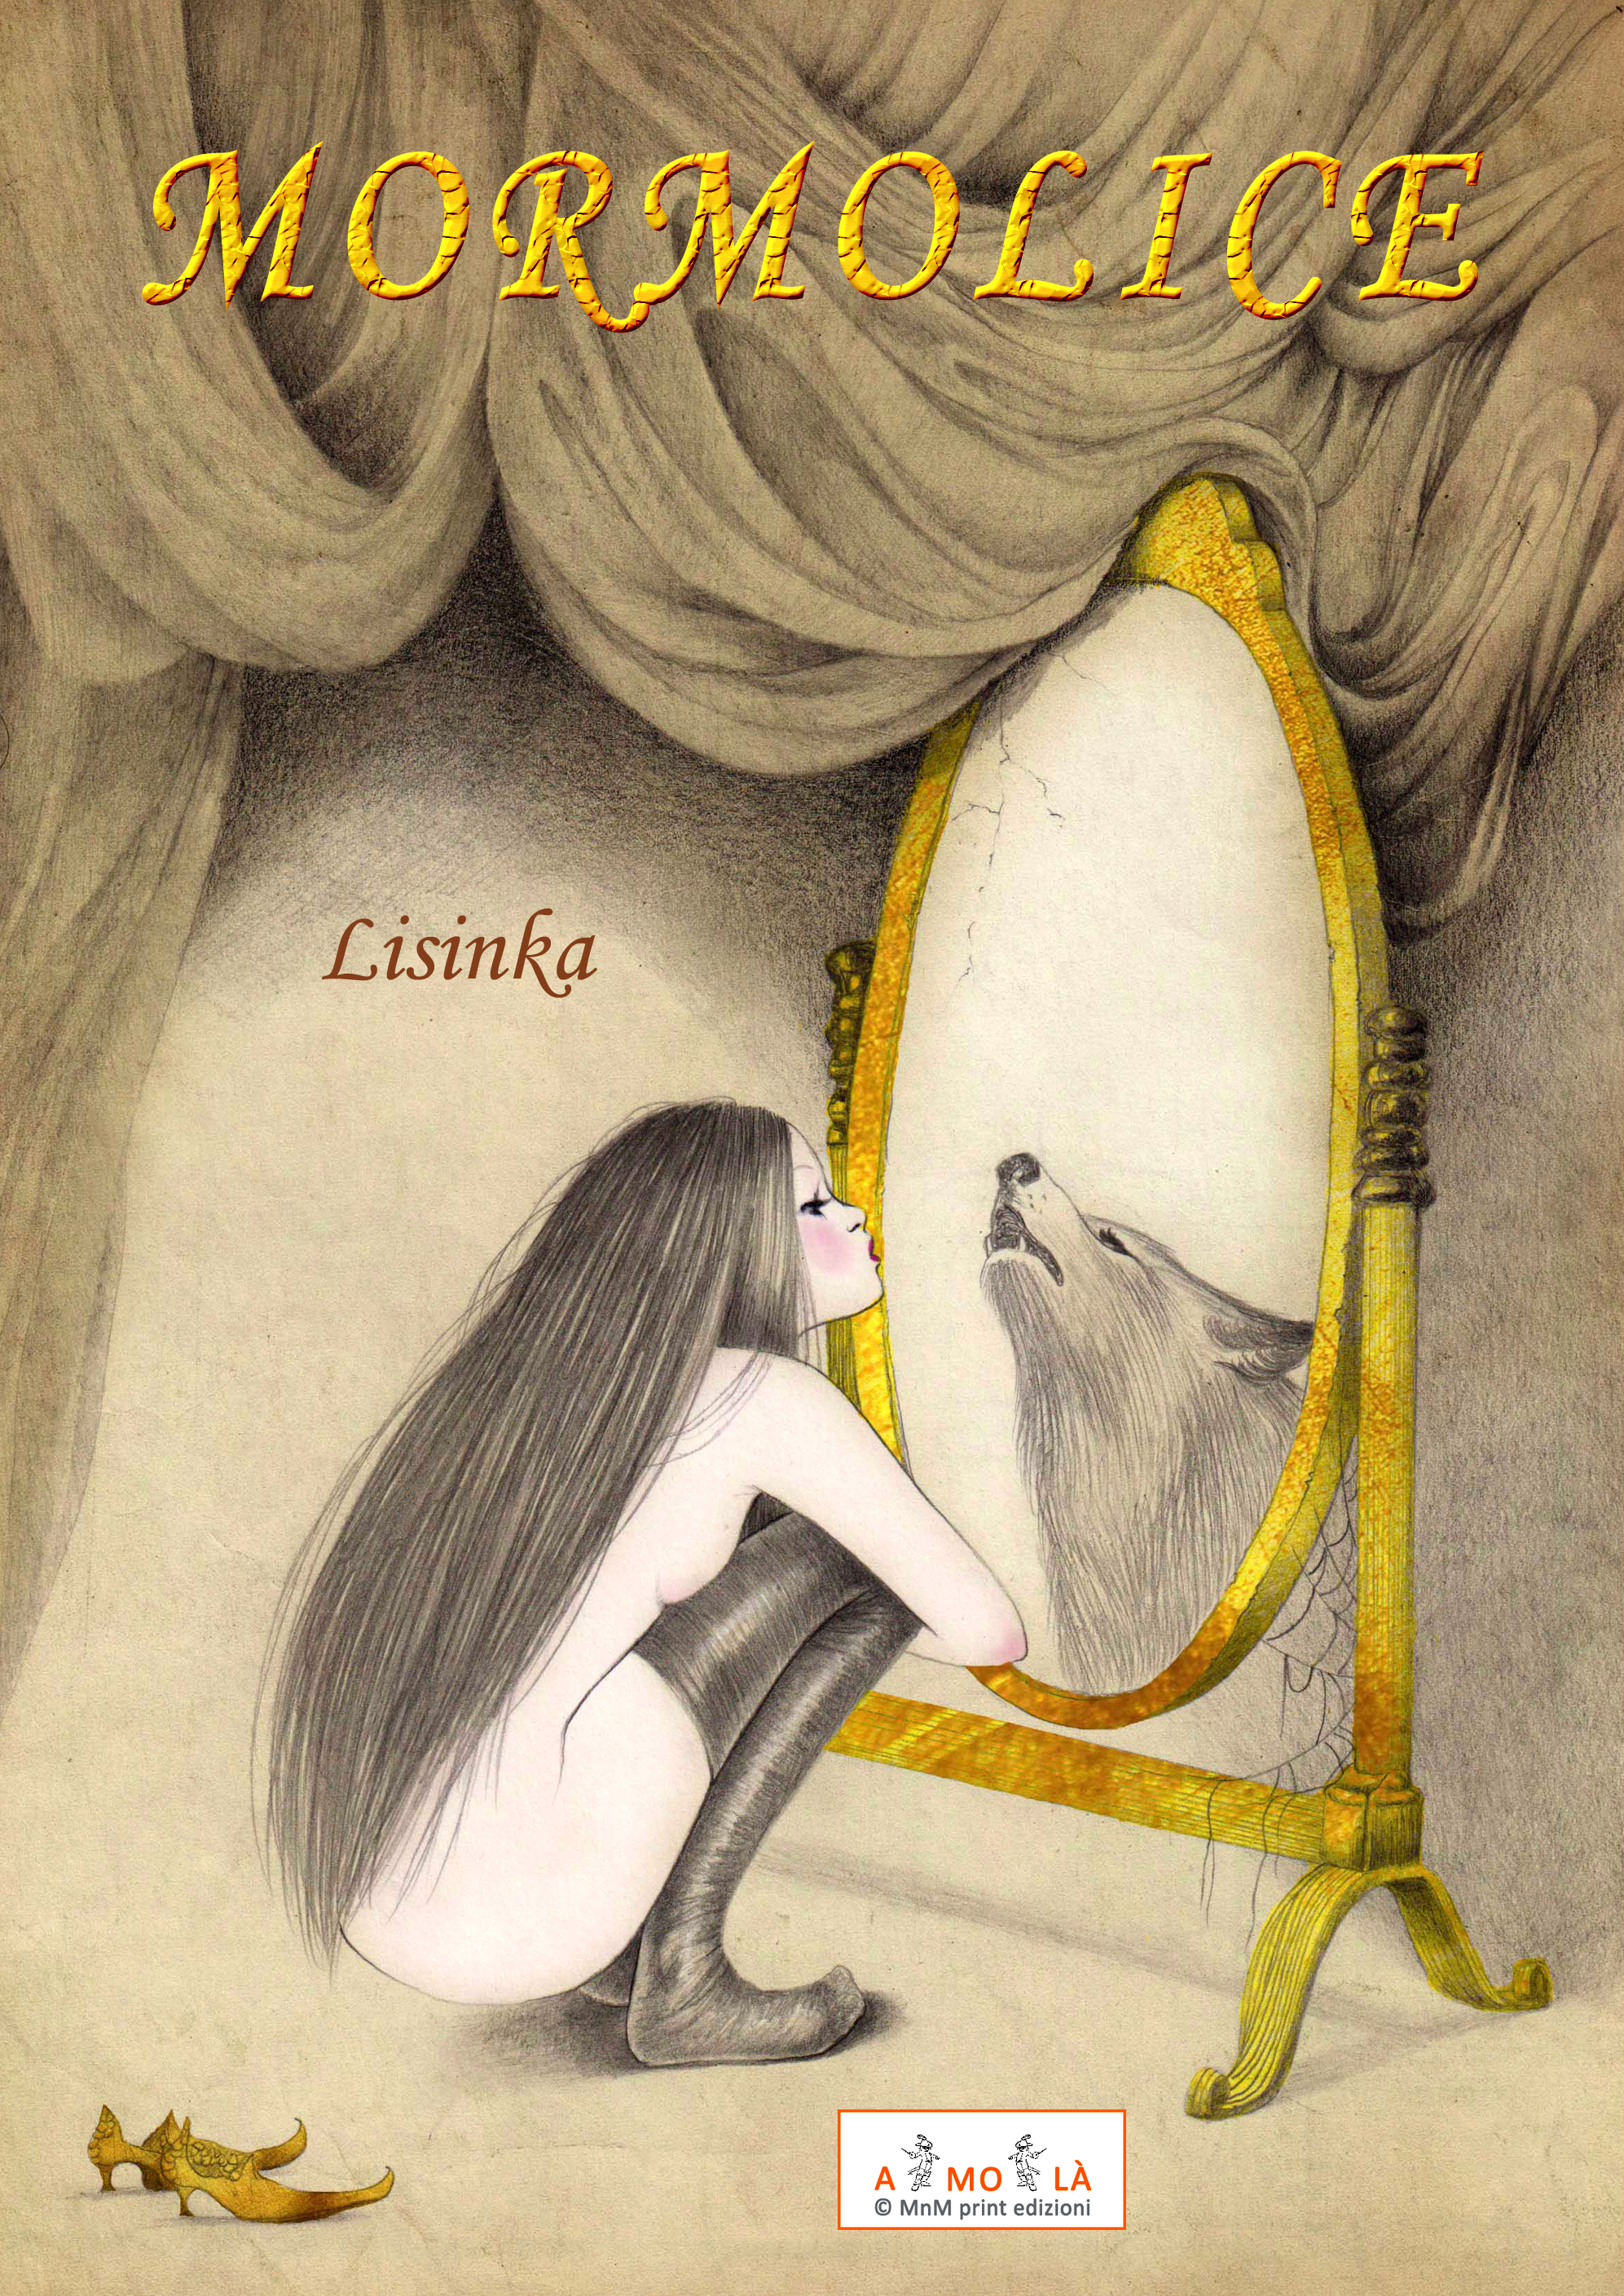 Mormolice – La bestia nel bosco addormentato (Mormolice – The beast into the sleeping wood)